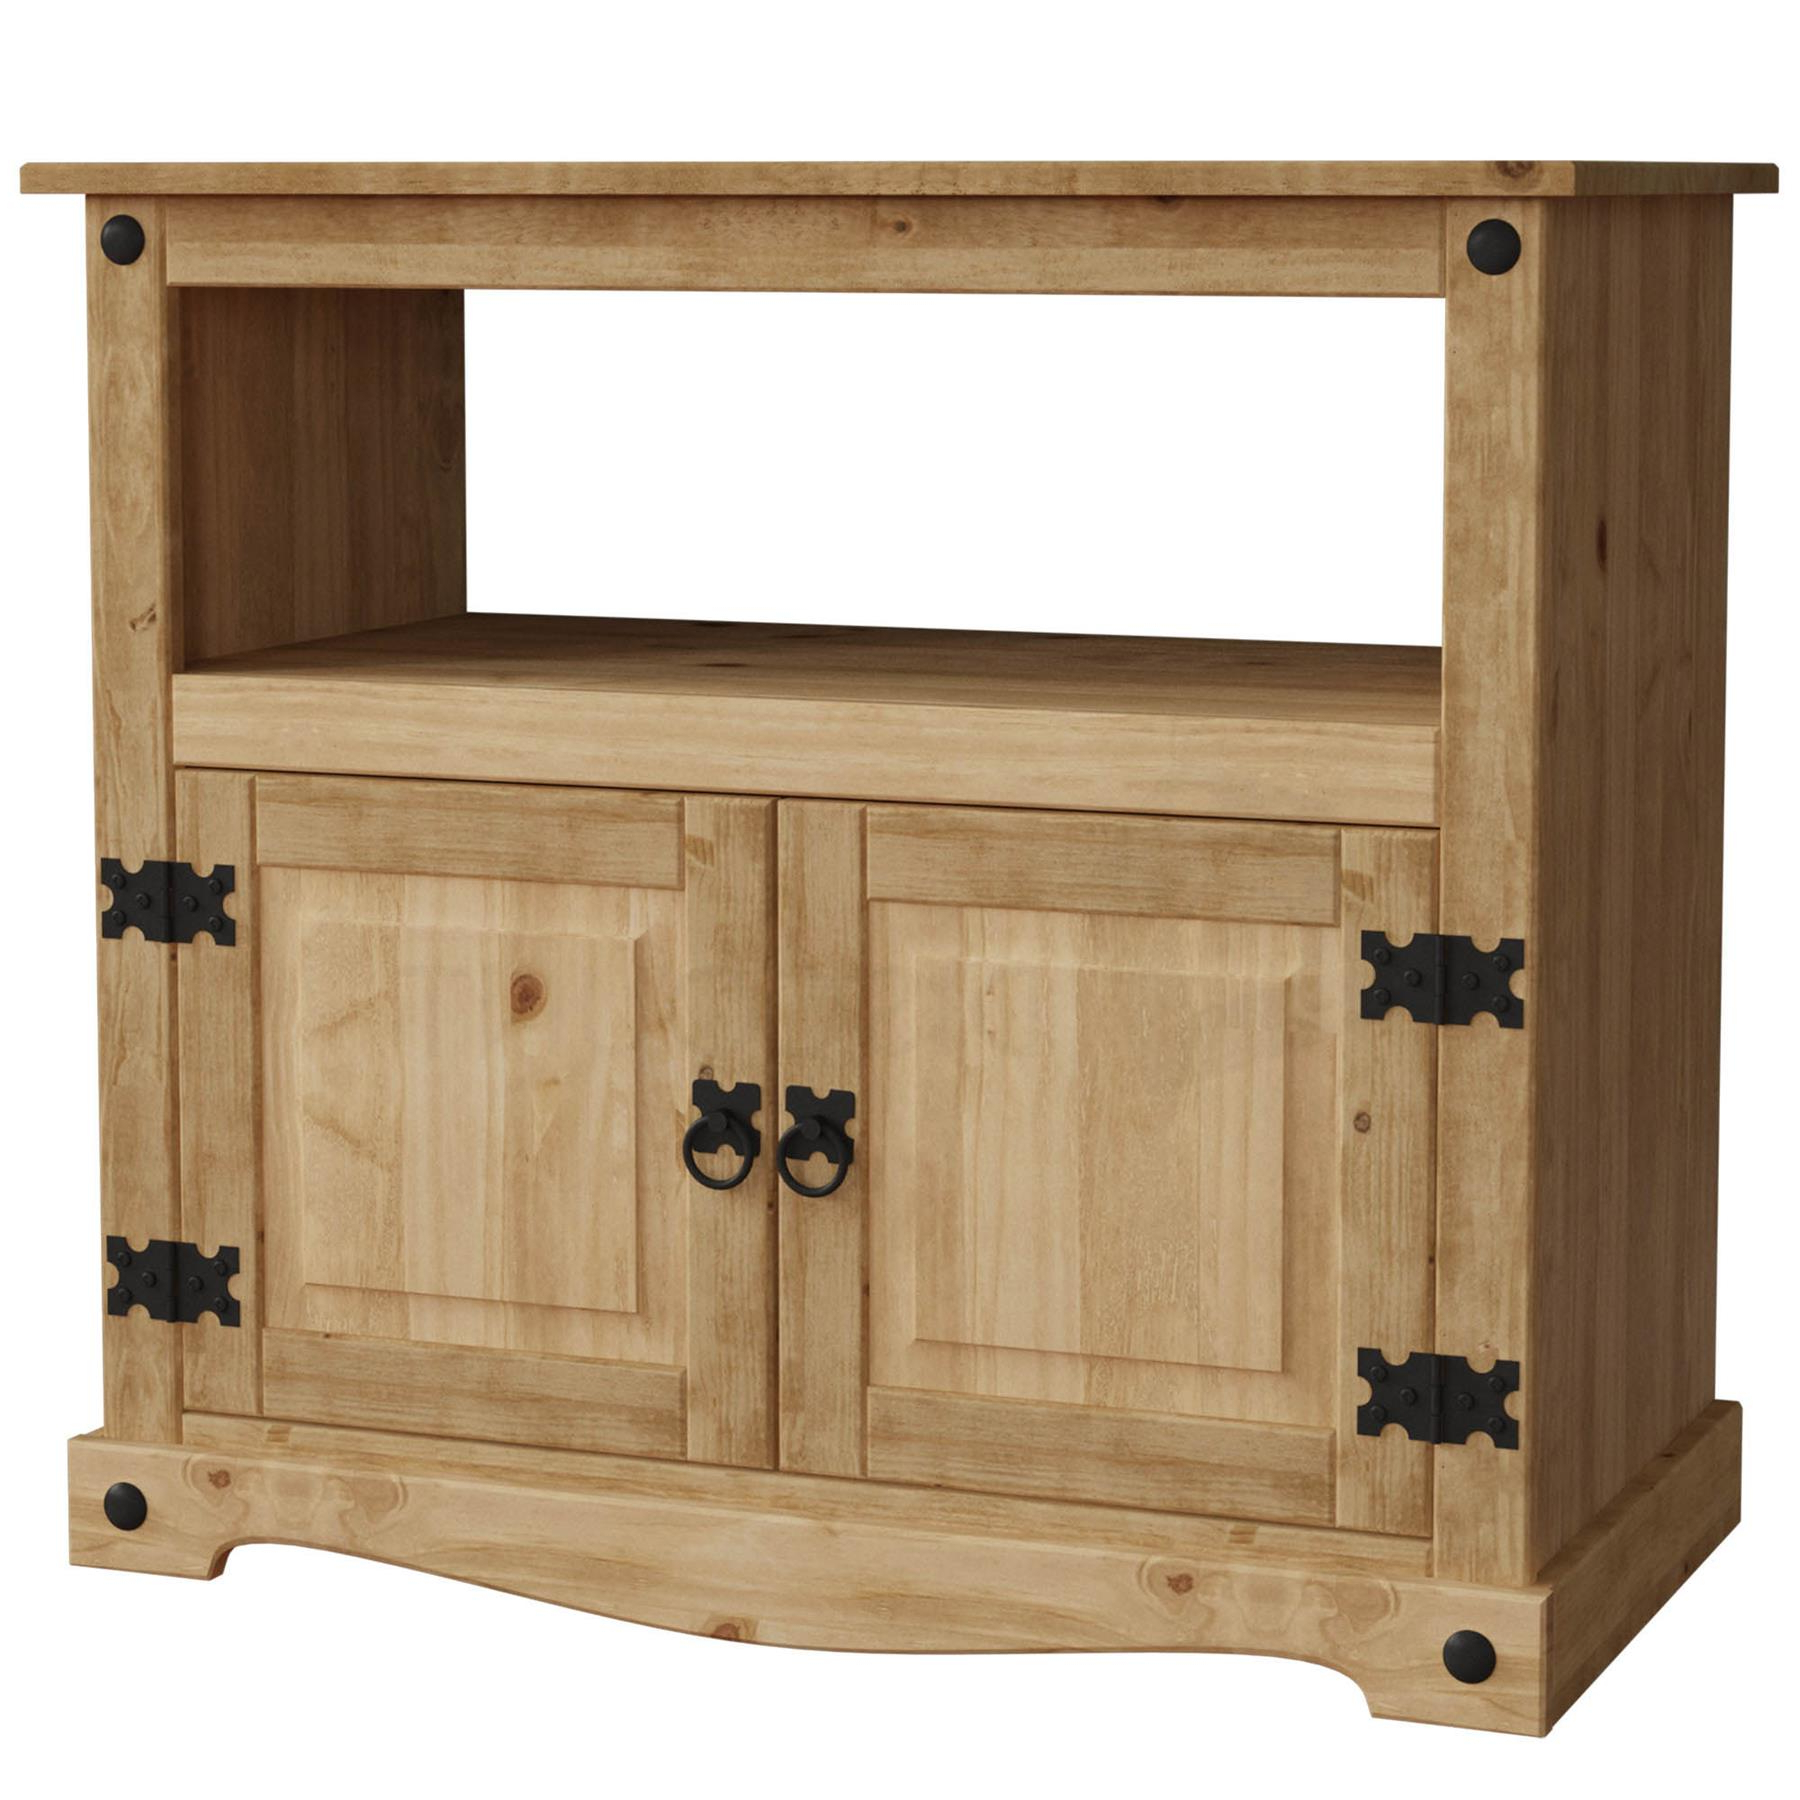 Corona Panama Tv Cabinet Media Dvd Unit Solid Pine Wood With Most Popular Corona Pine 2 Door 1 Shelf Flat Screen Tv Unit Stands (View 7 of 10)